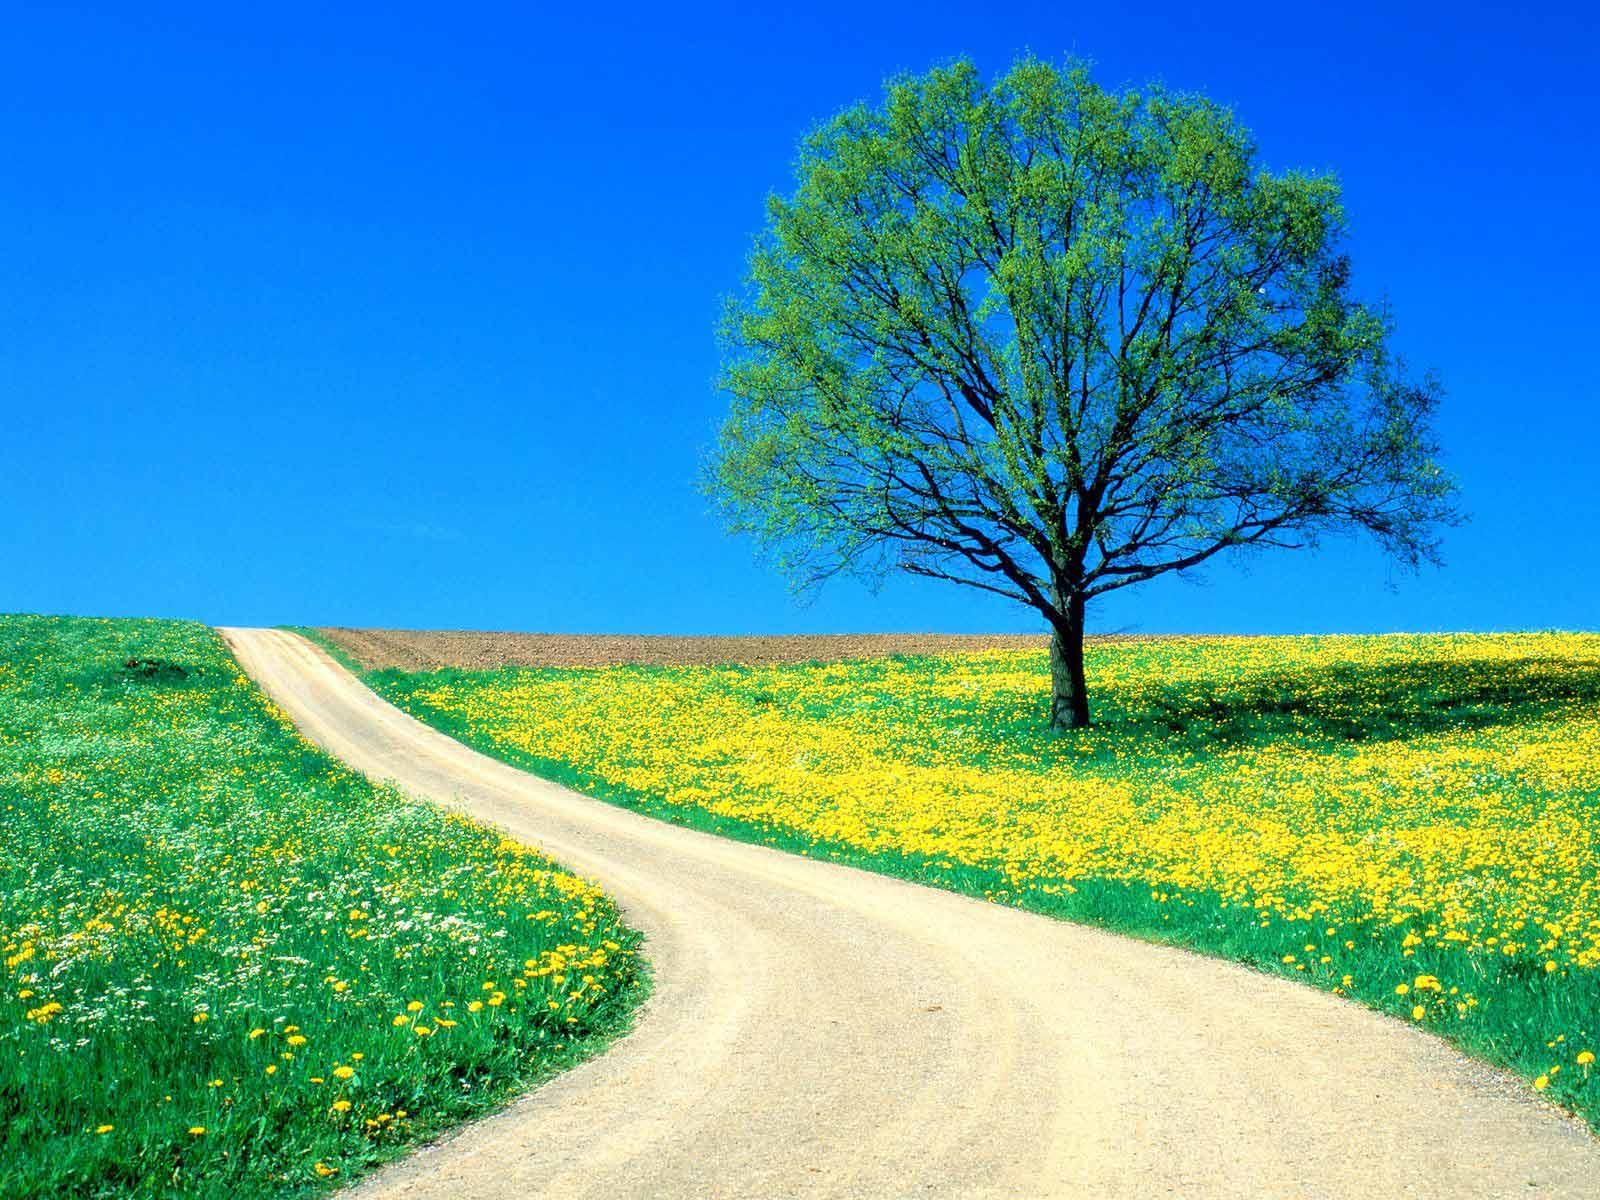 http://2.bp.blogspot.com/-oozGeZmZtEA/TeFwIwo5HDI/AAAAAAAAAF4/cBjr6_owLO4/s1600/spring_wallpapers_free_Flowers___Spring_Road.jpg